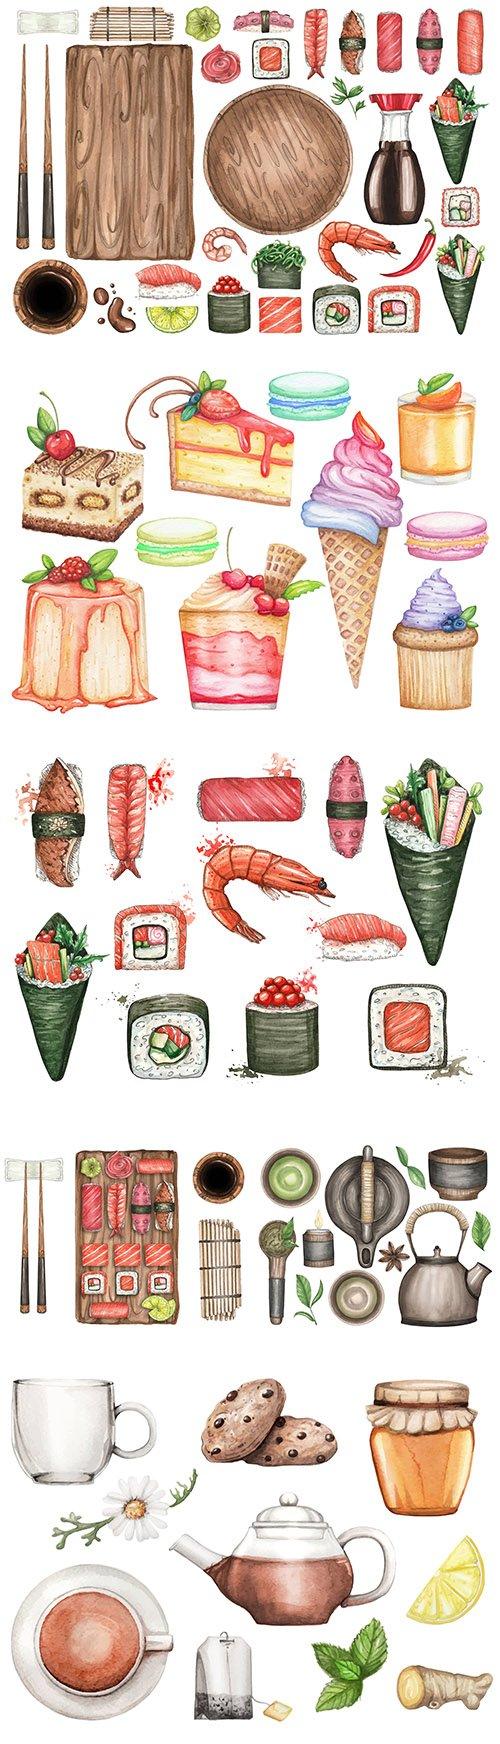 Sushi and tea dessert watercolor set illustrations